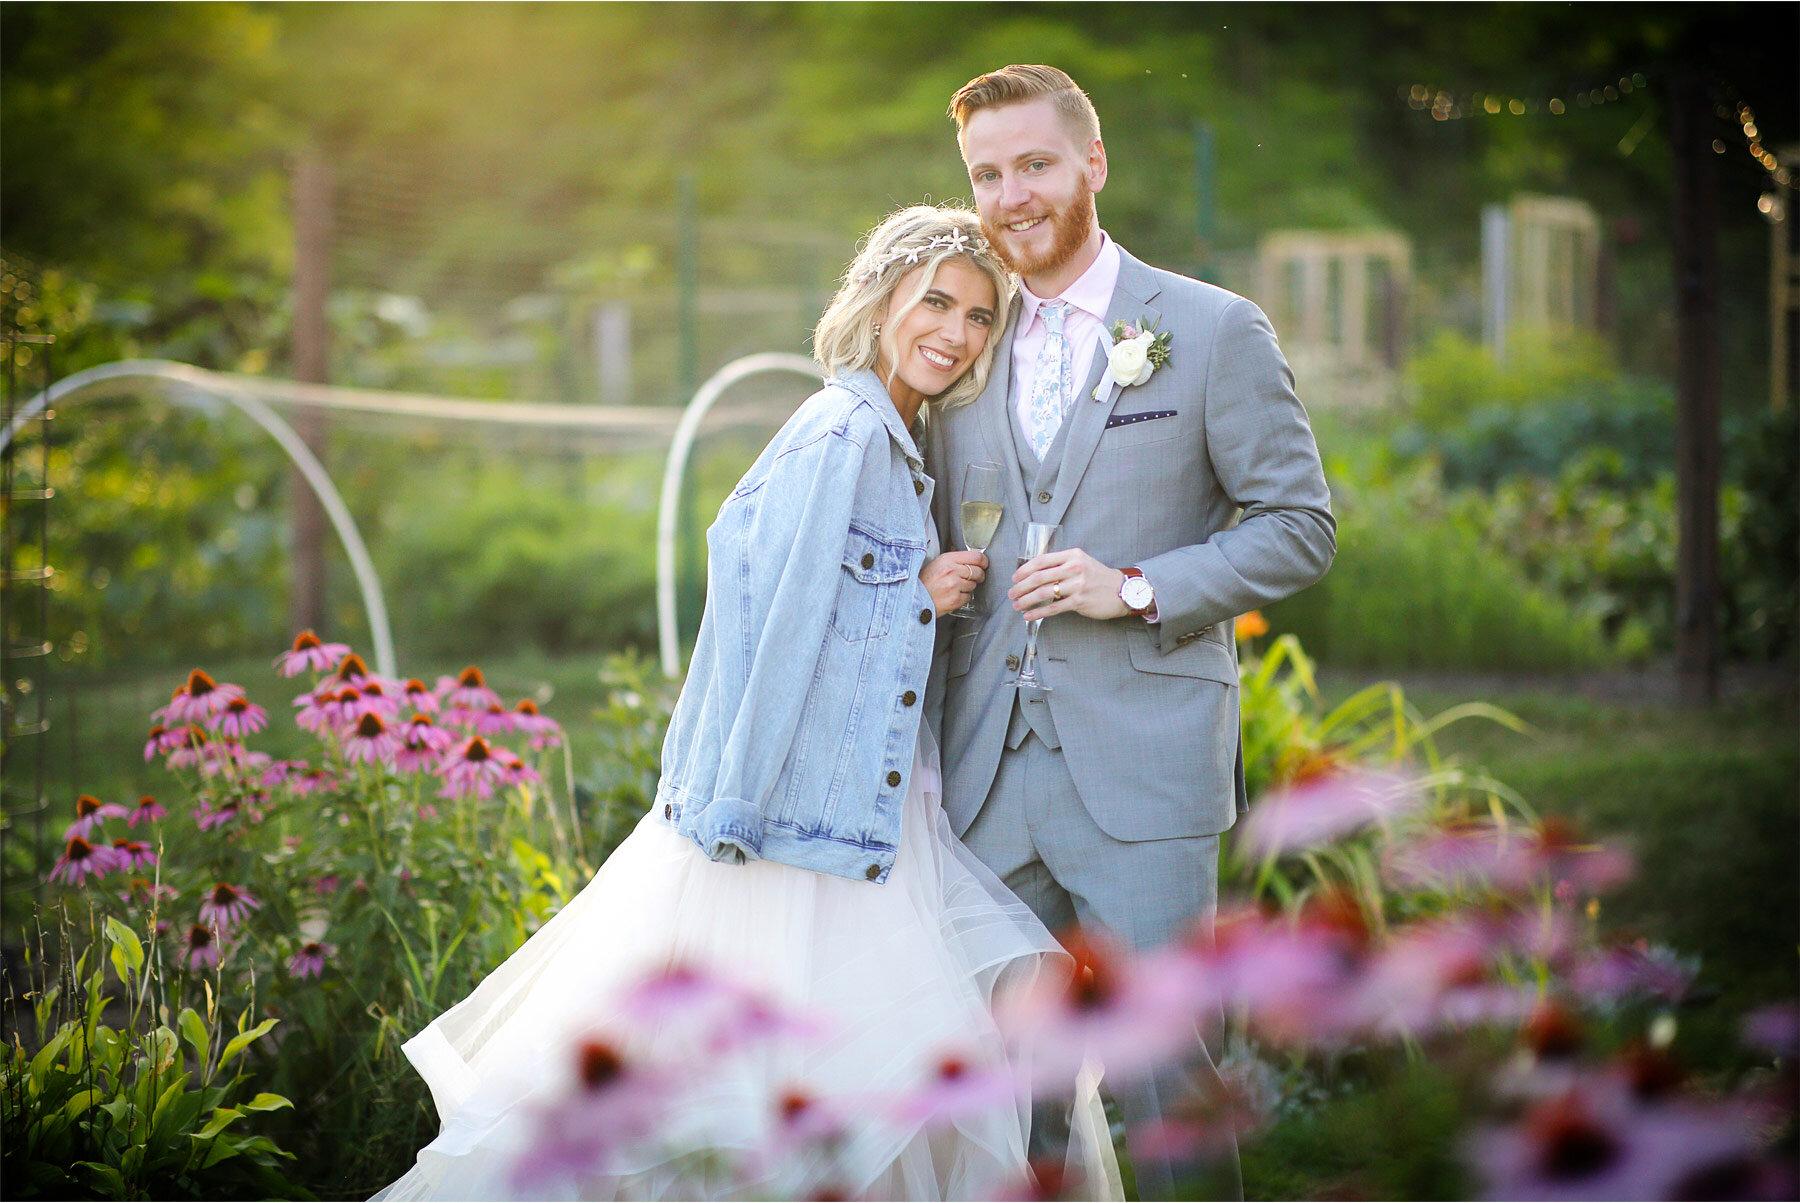 18-Vick-Photography-Wedding-Duluth-Minnesota-Glensheen-Mansion-Bride-Groom-Gardens-Summer-Flowers-Jean-Jacket-Catherine-and-John.jpg